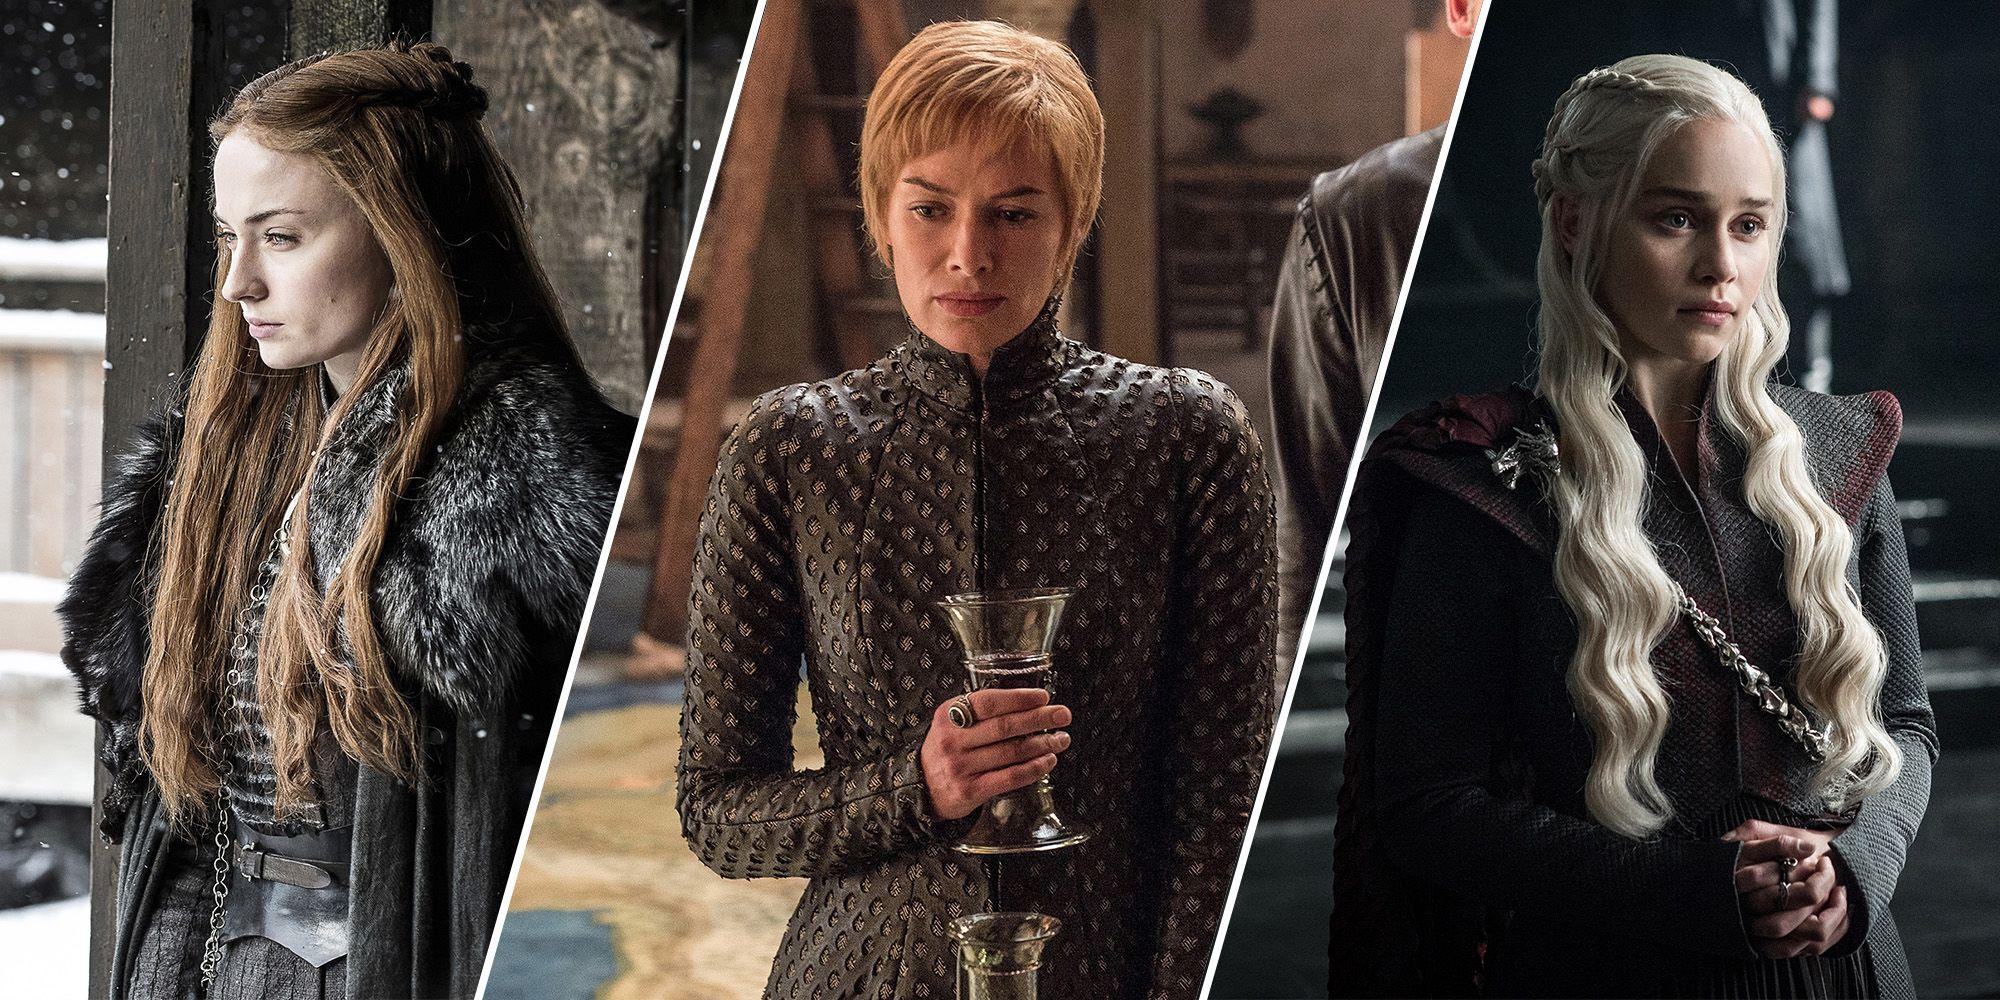 Game Of Thrones Costume Designer Michele Clapton Explains Cersei Sansa And Daenerys Easter Eggs Michele Clapton Talks The Crown Got Season 7 Costume Secrets